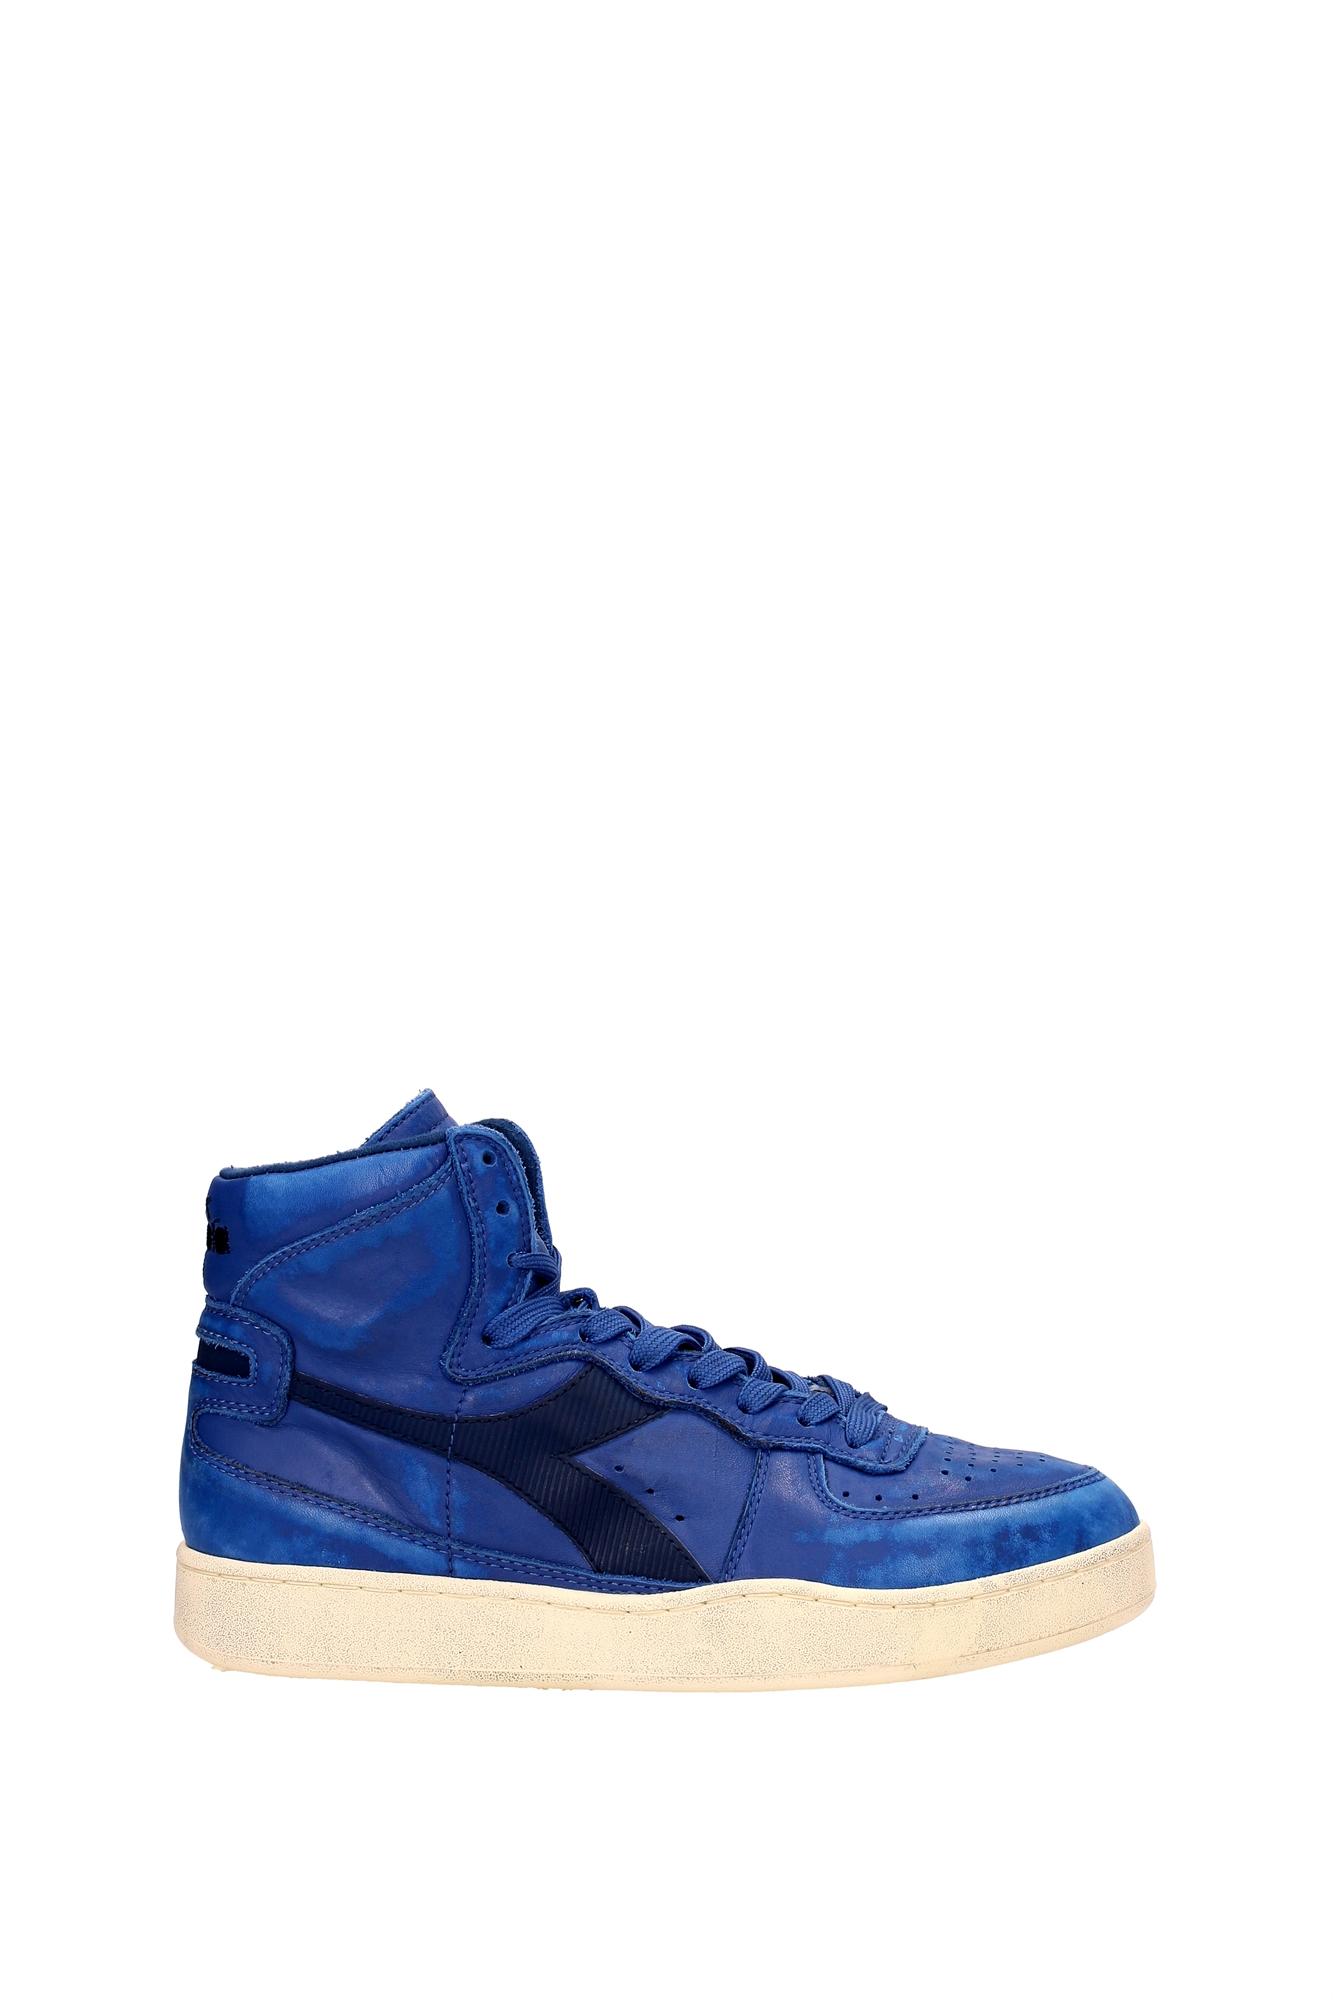 info for 6343d a8f62 ... Nike Nike Nike Air Max 95 Premium SE, US 9, 924478-201, ...